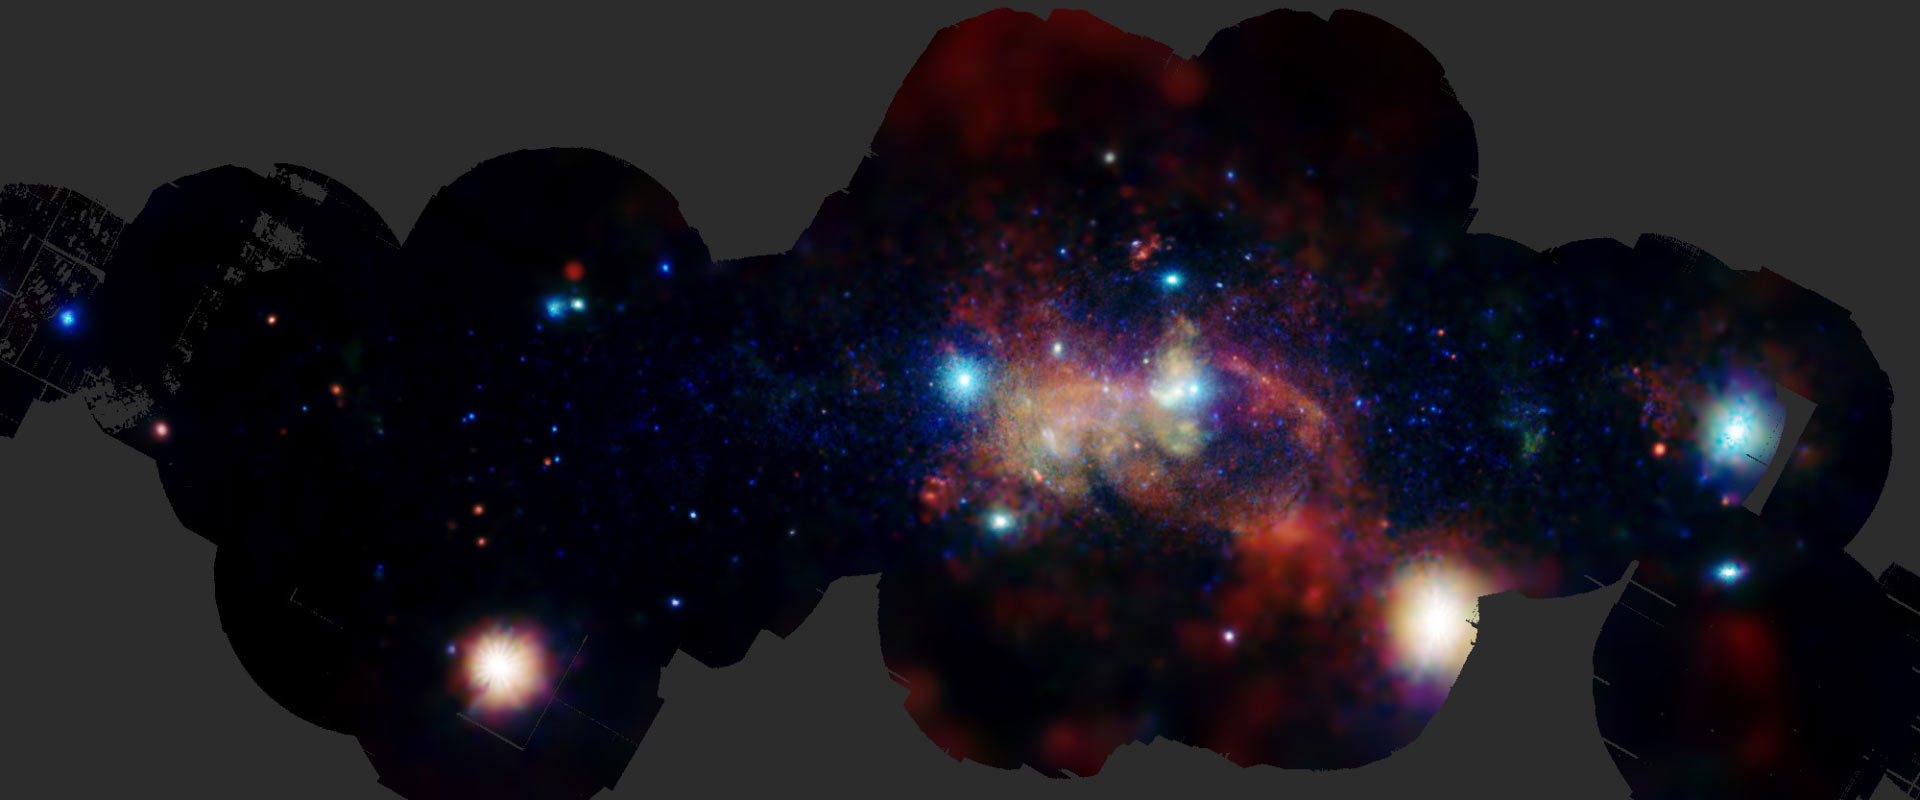 image_3158_3e-Milky-Way-Center